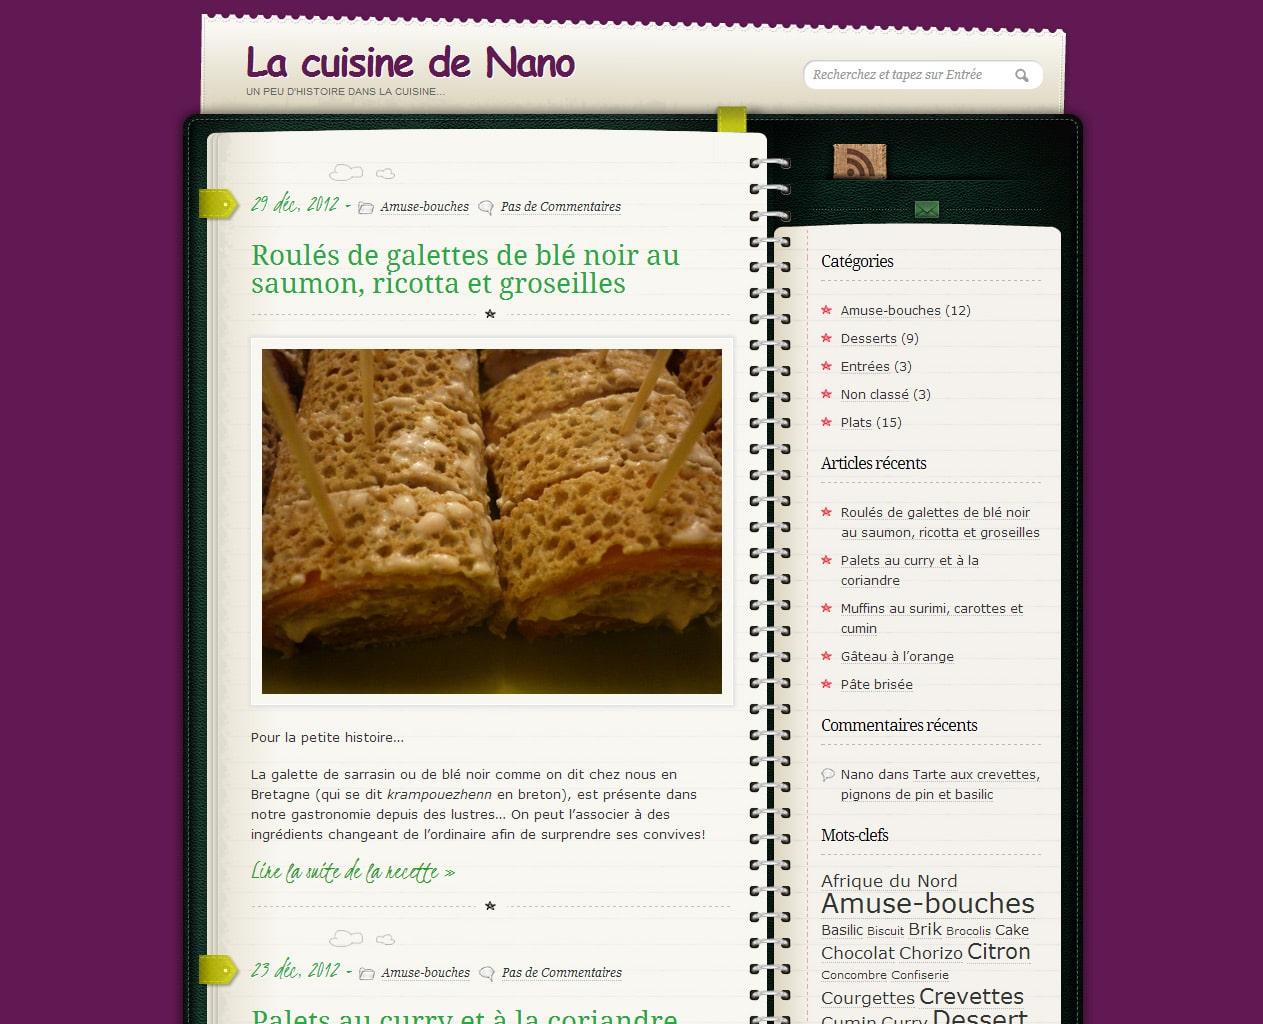 La cuisine de Nano